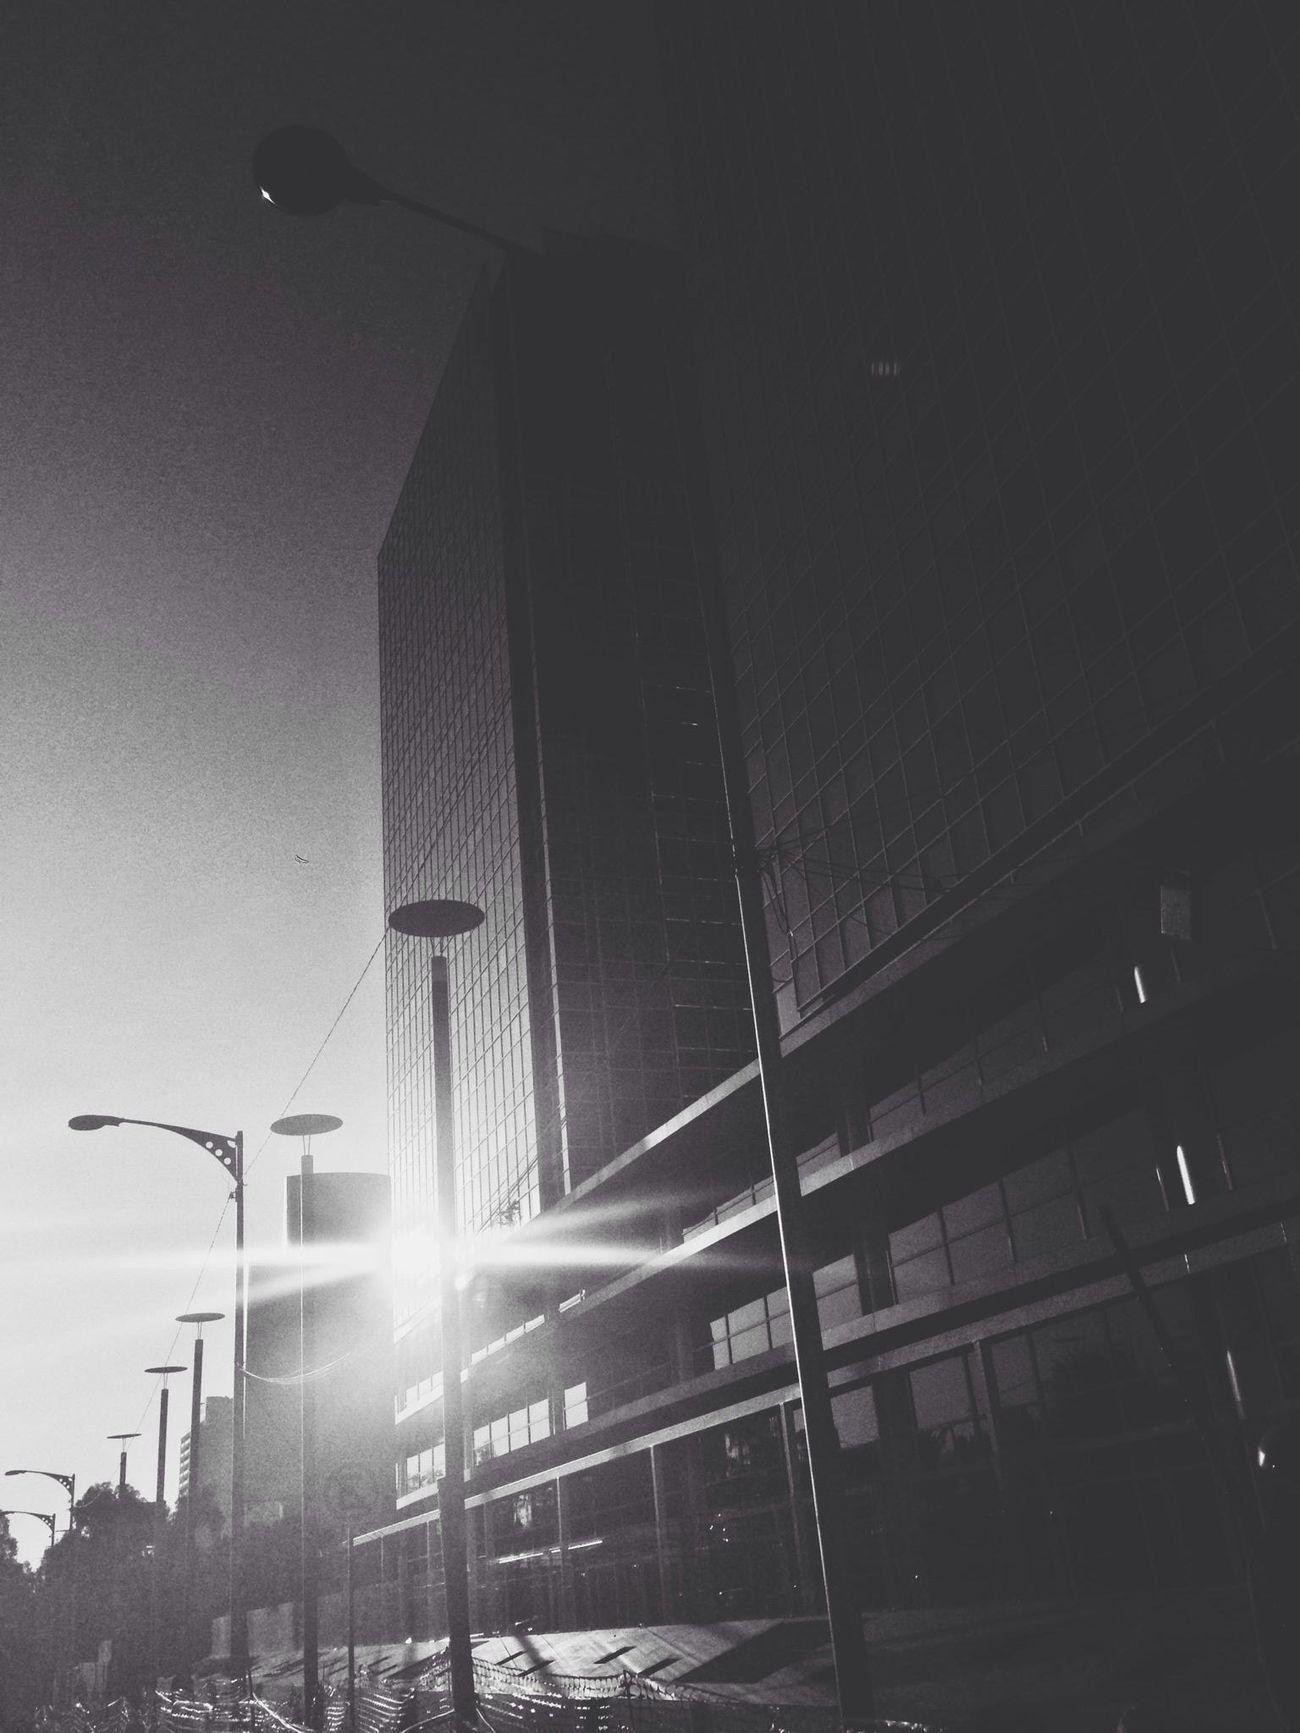 Silhouette Streetphoto_bw Blackandwhite